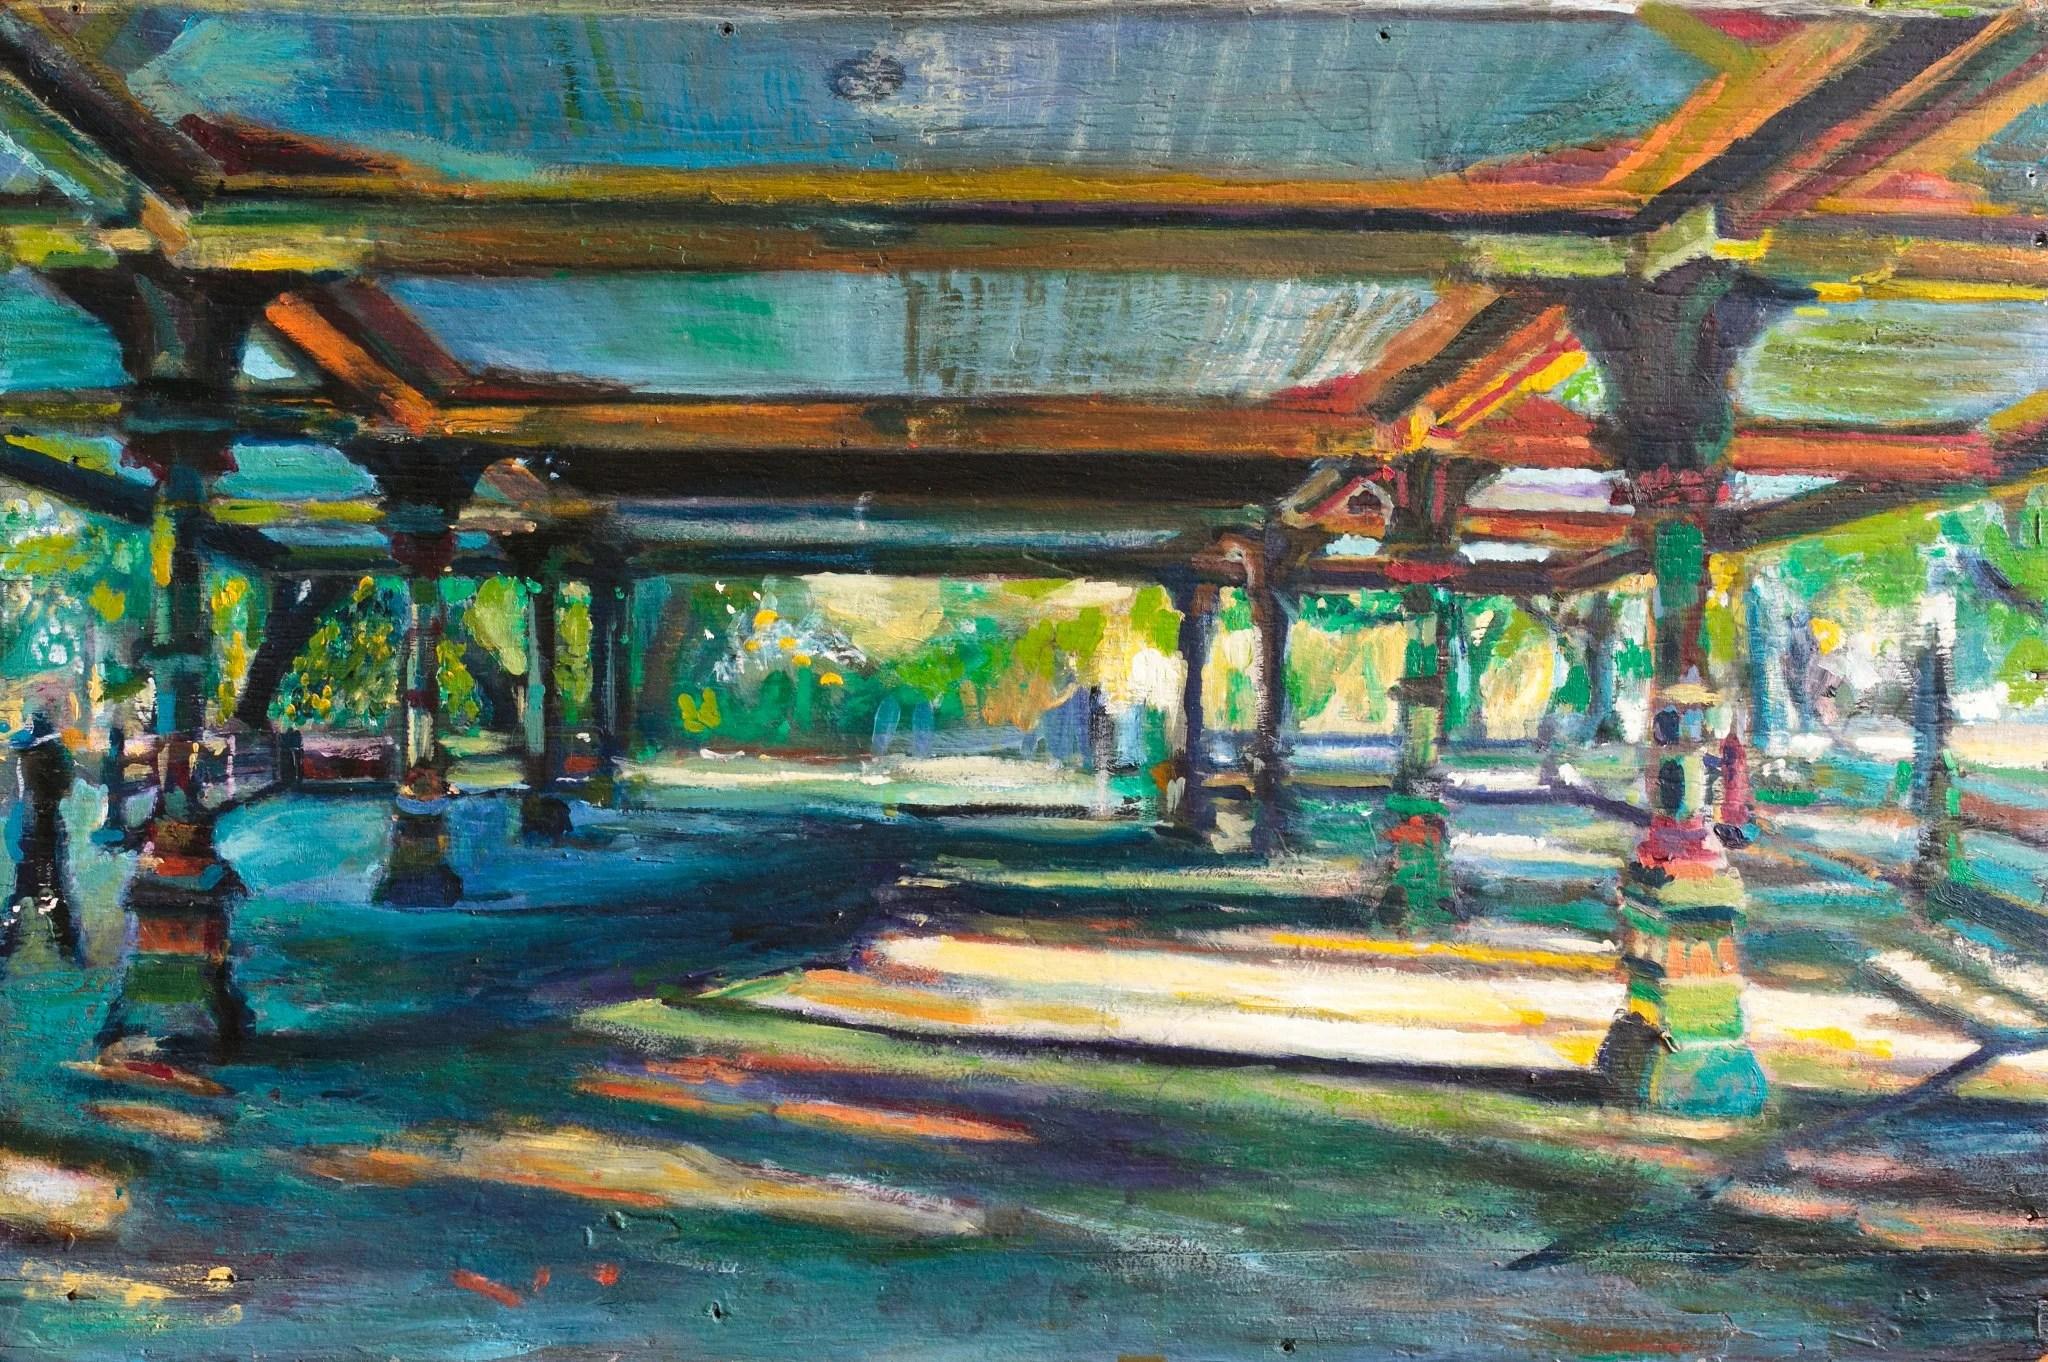 Prospect Park Pavillion painting by Noel Hefele